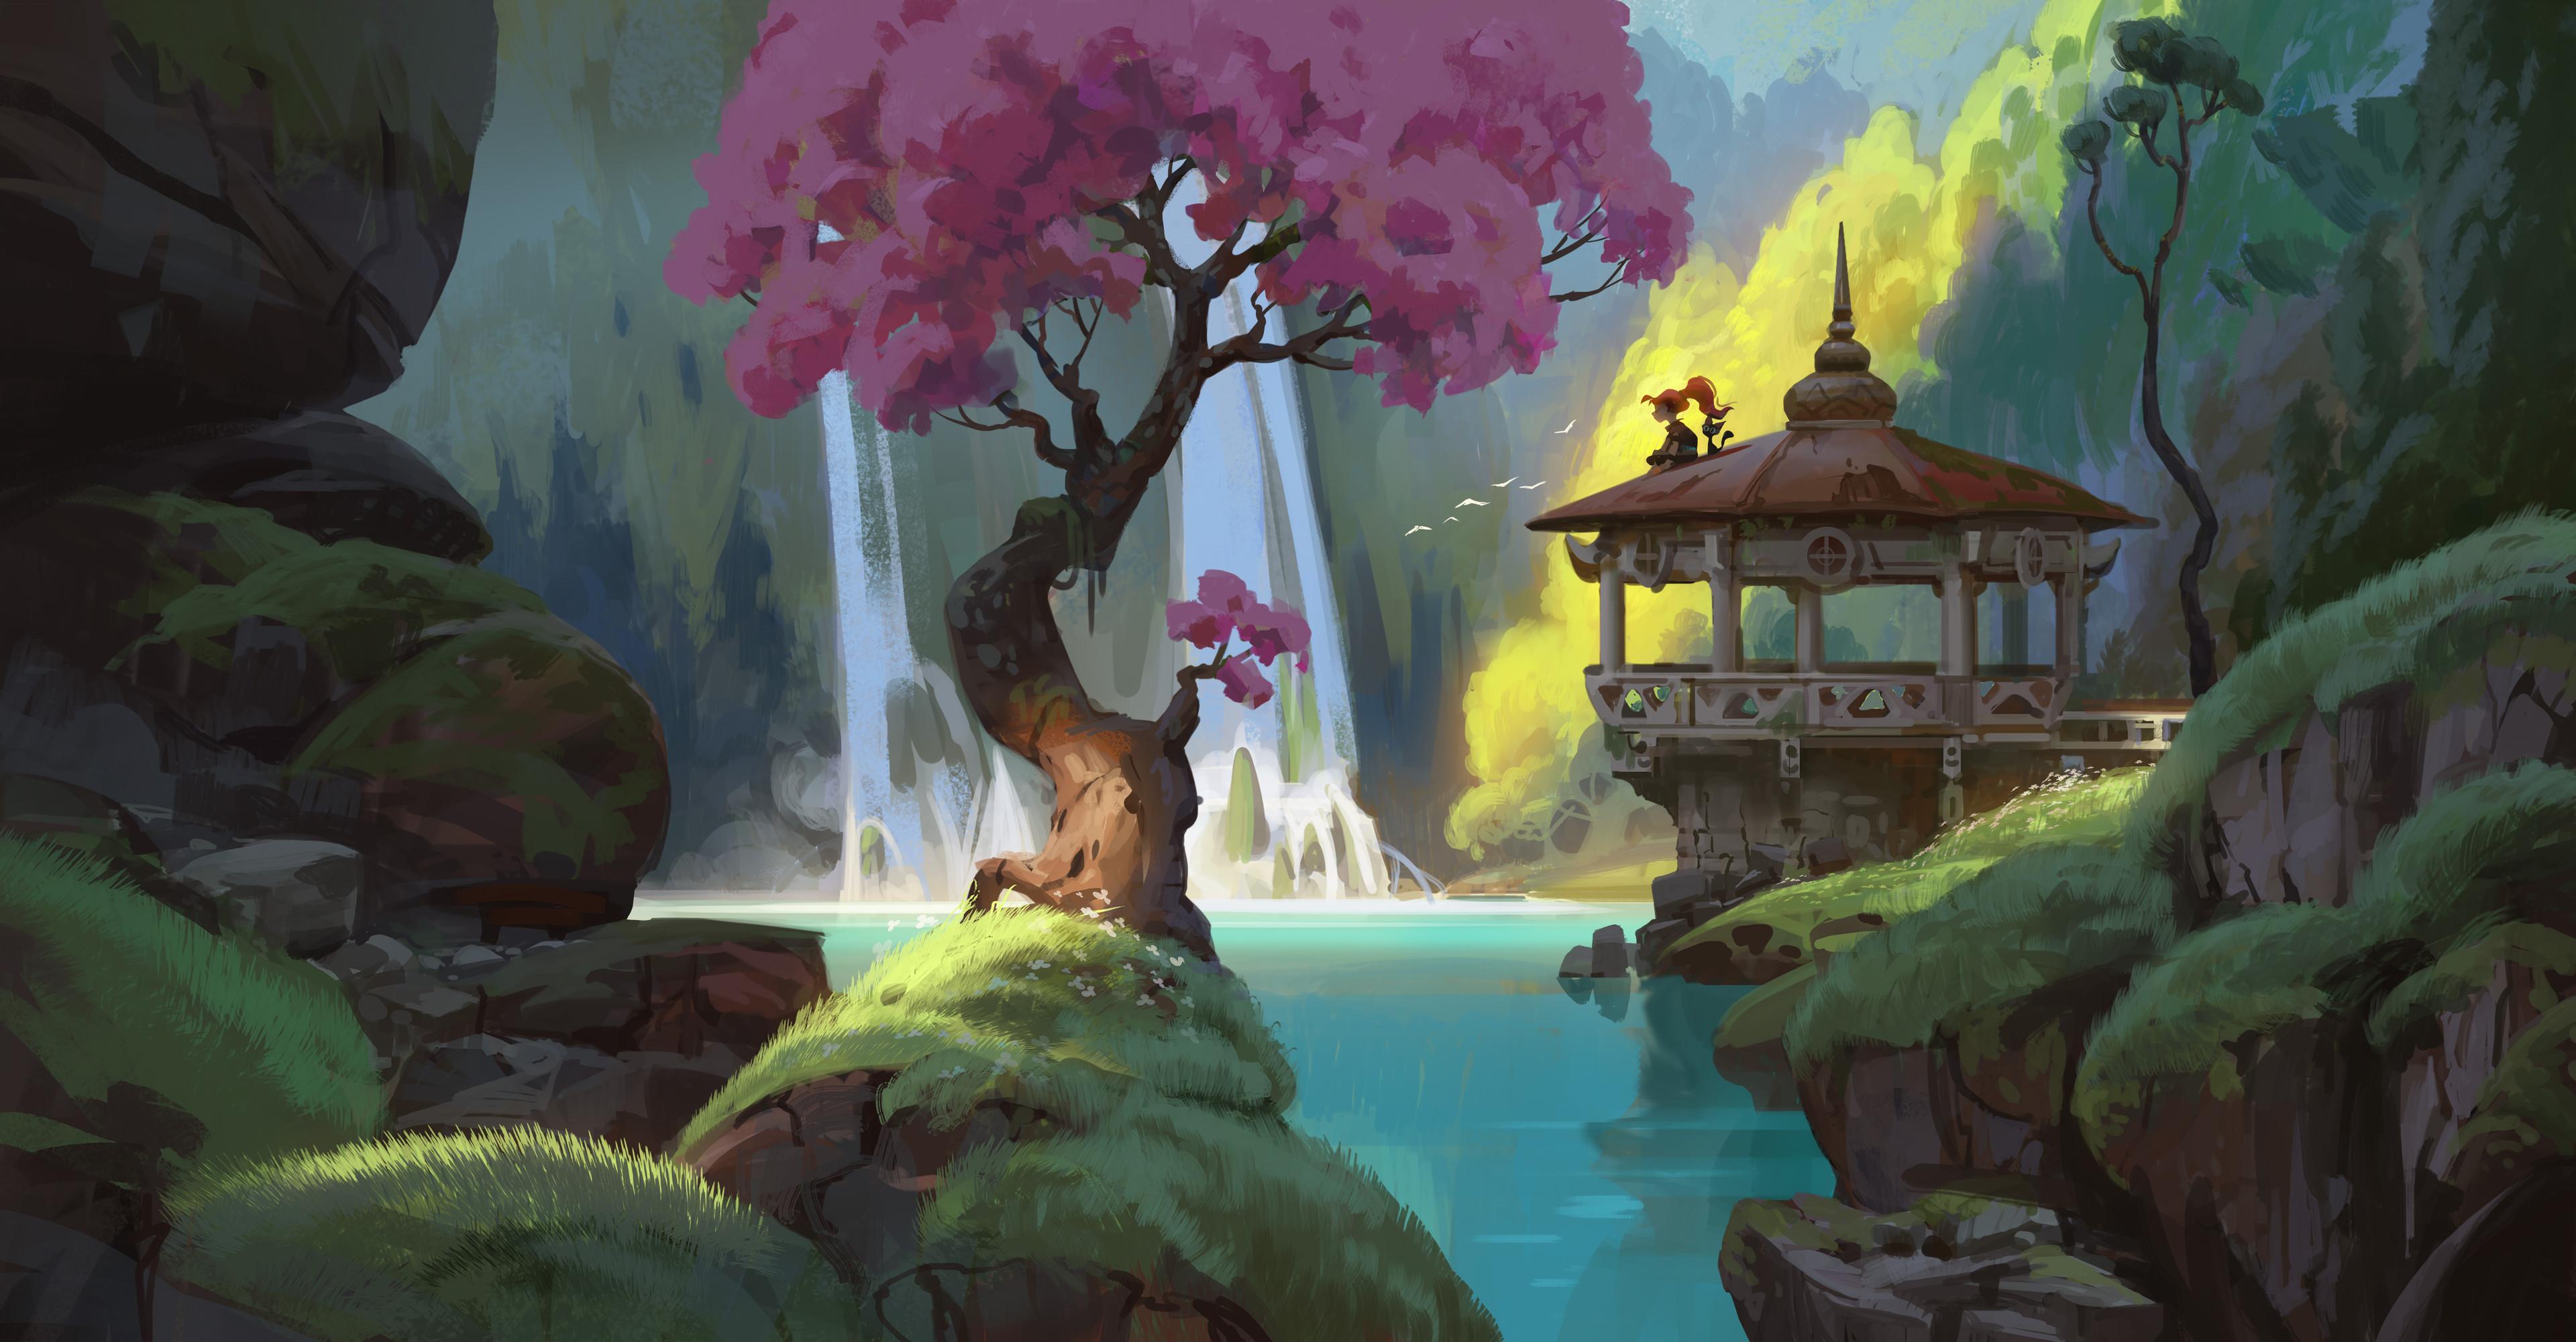 General 3840x2000 Chaichan Artwichai digital fantasy art nature waterfall trees fantasy girl sitting